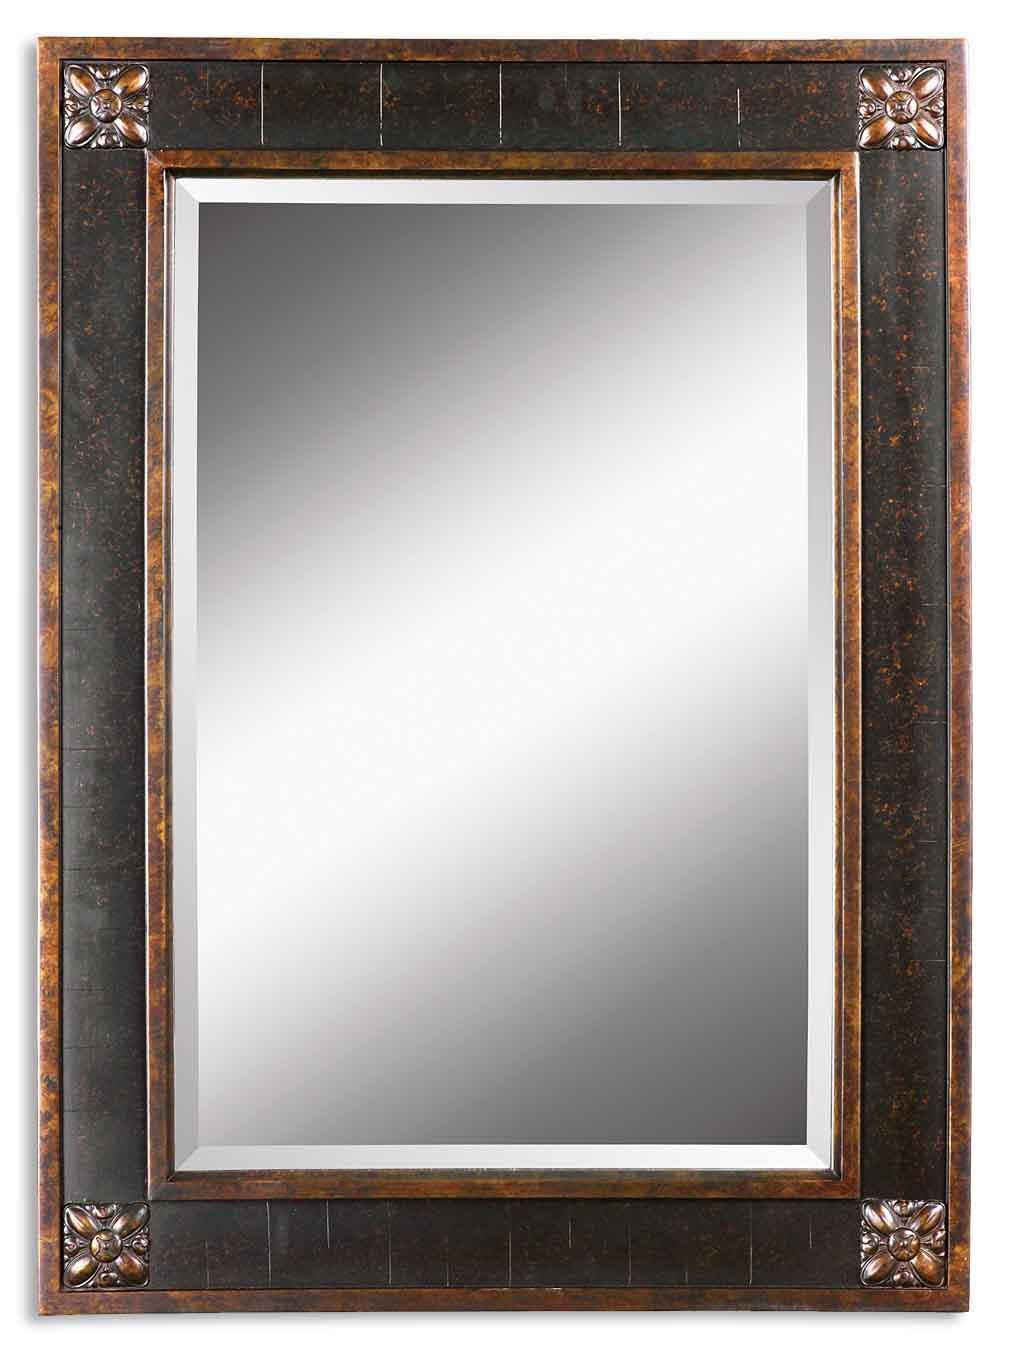 Mirrors Bergamo Vanity by Uttermost at Wayside Furniture